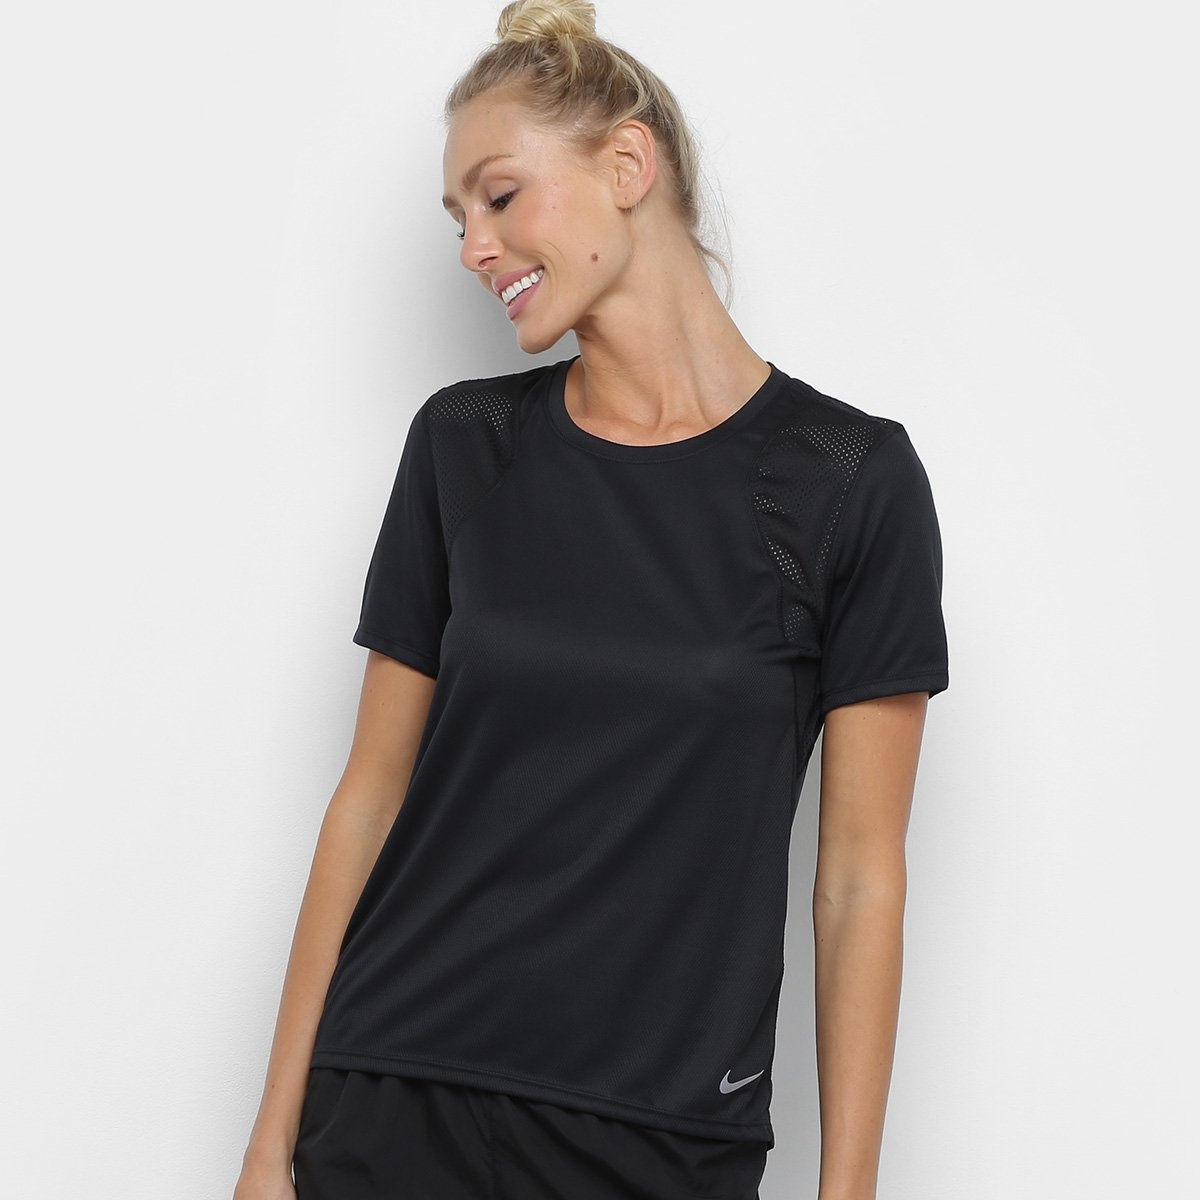 Camiseta Nike DRI-FIT Run Feminina - Tam: G